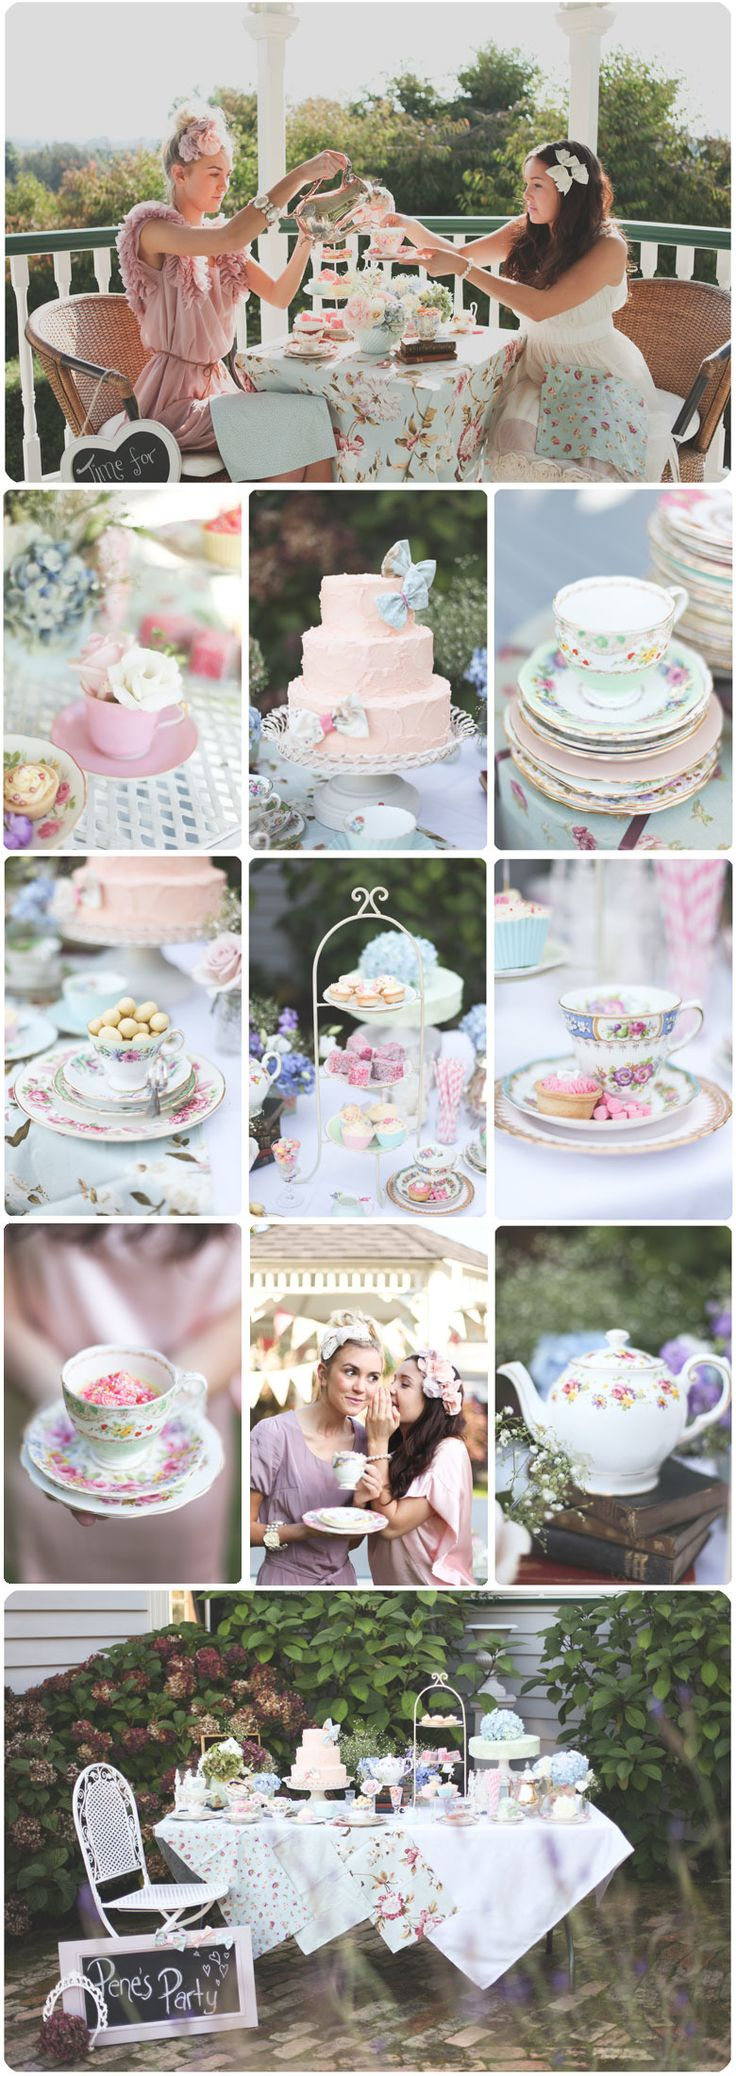 1950's wedding decorations november 2018  best wedding ideas images on Pinterest  Short wedding gowns